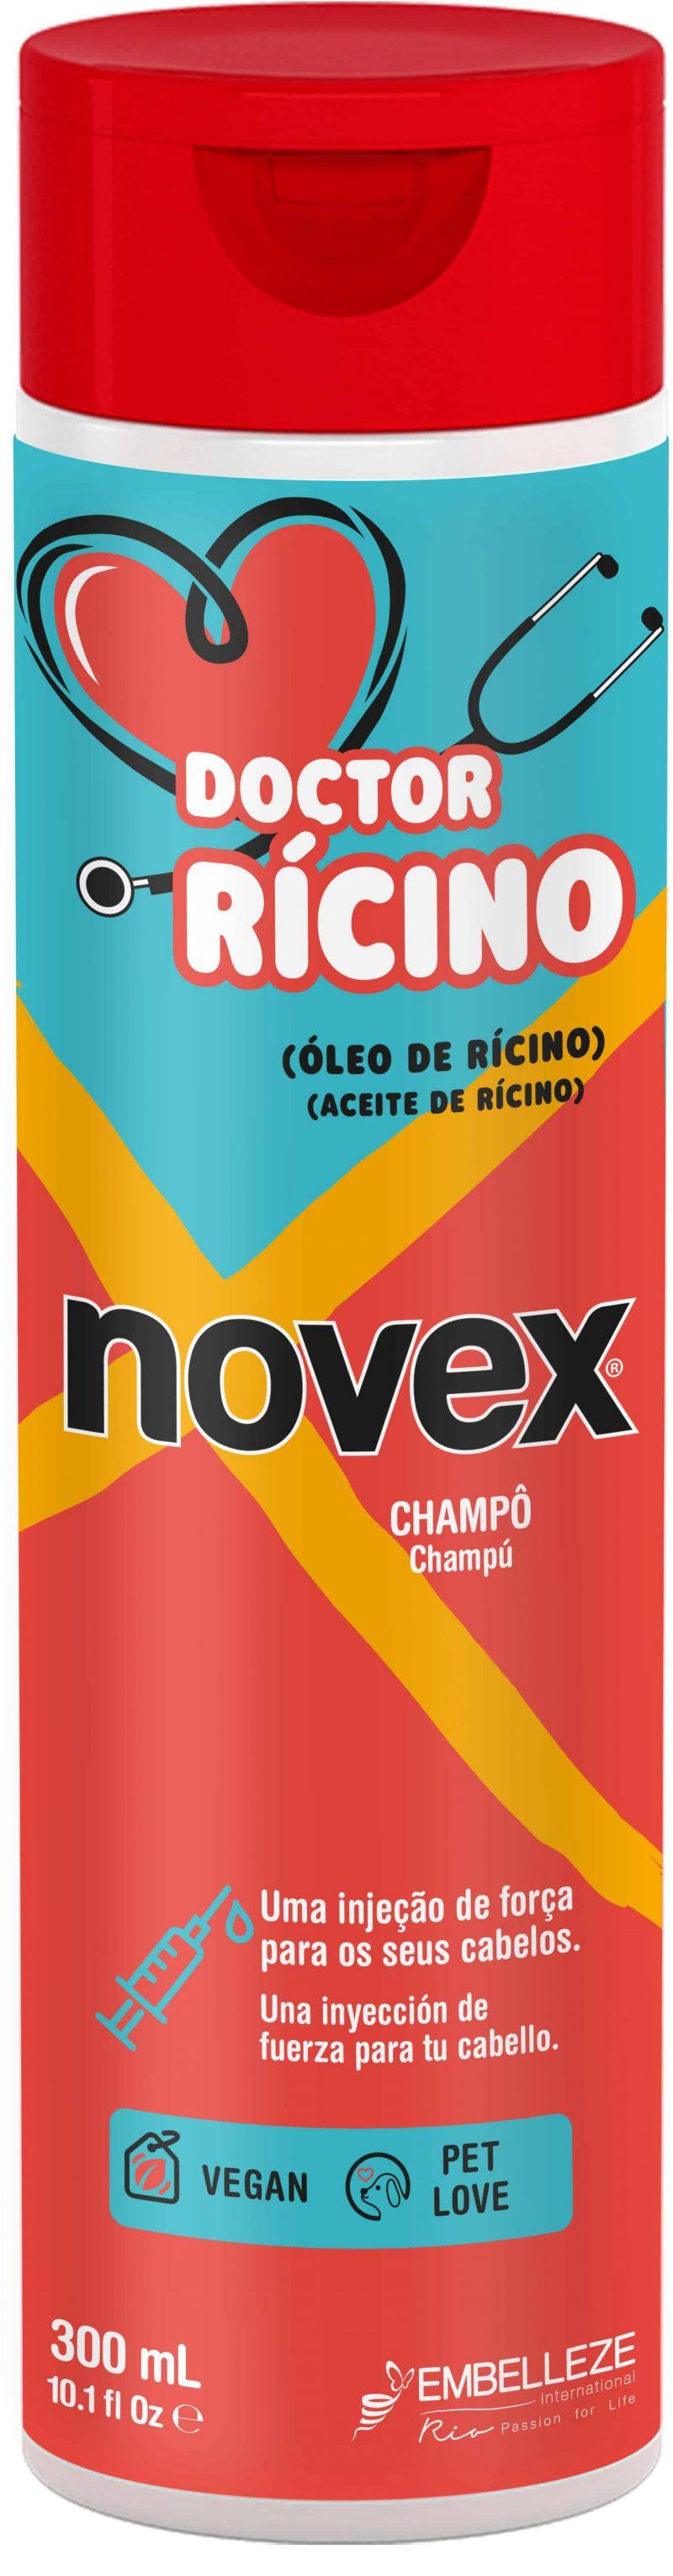 7121 Champô Novex Doctor Rícino 300mL scaled